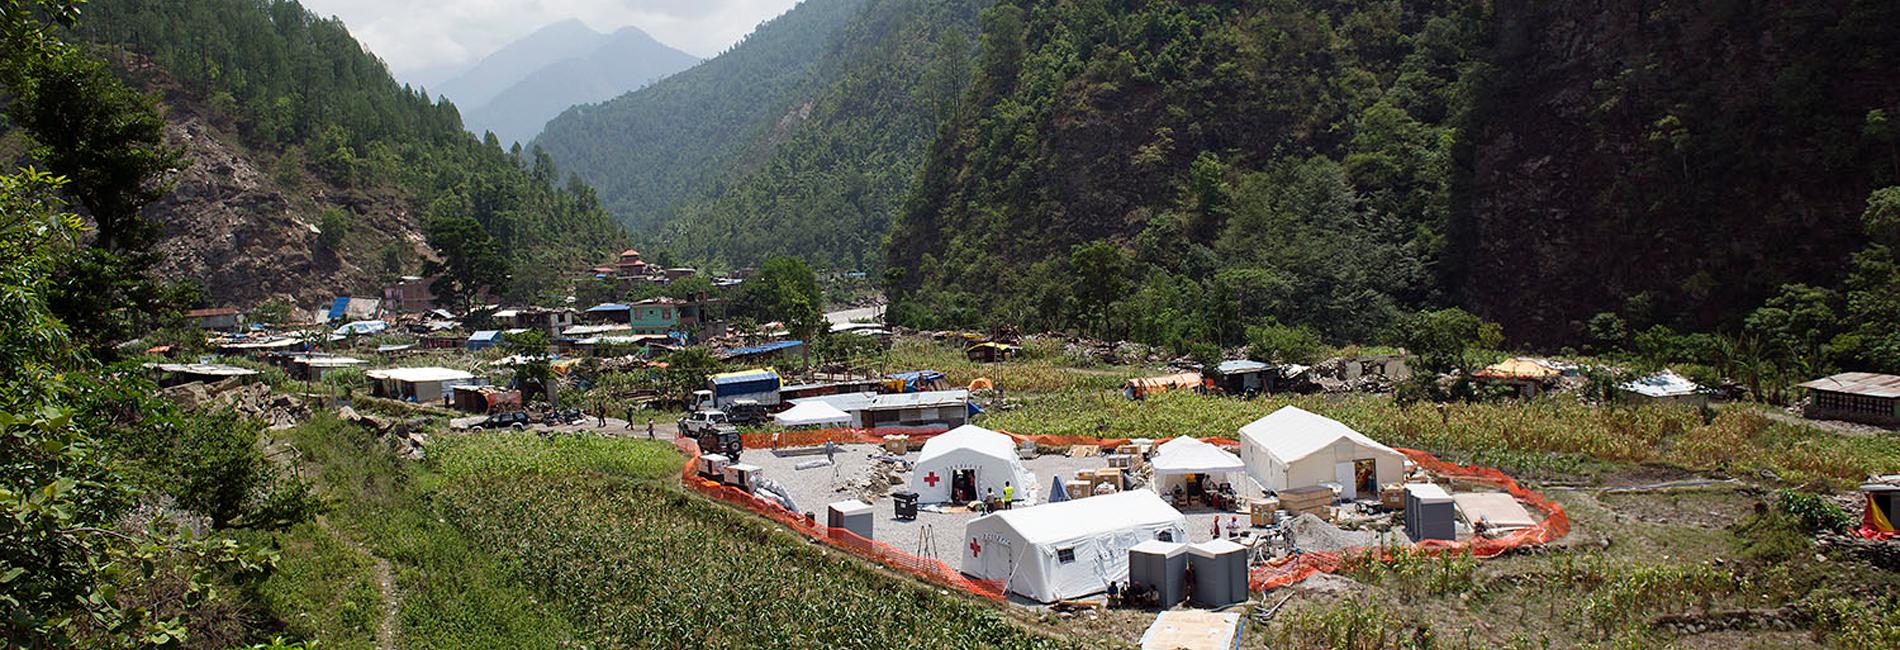 Erdbeben in Nepal im April und Mai 2015: mobile Klinik vom Roten Kreuz in Singati - Juni 2015